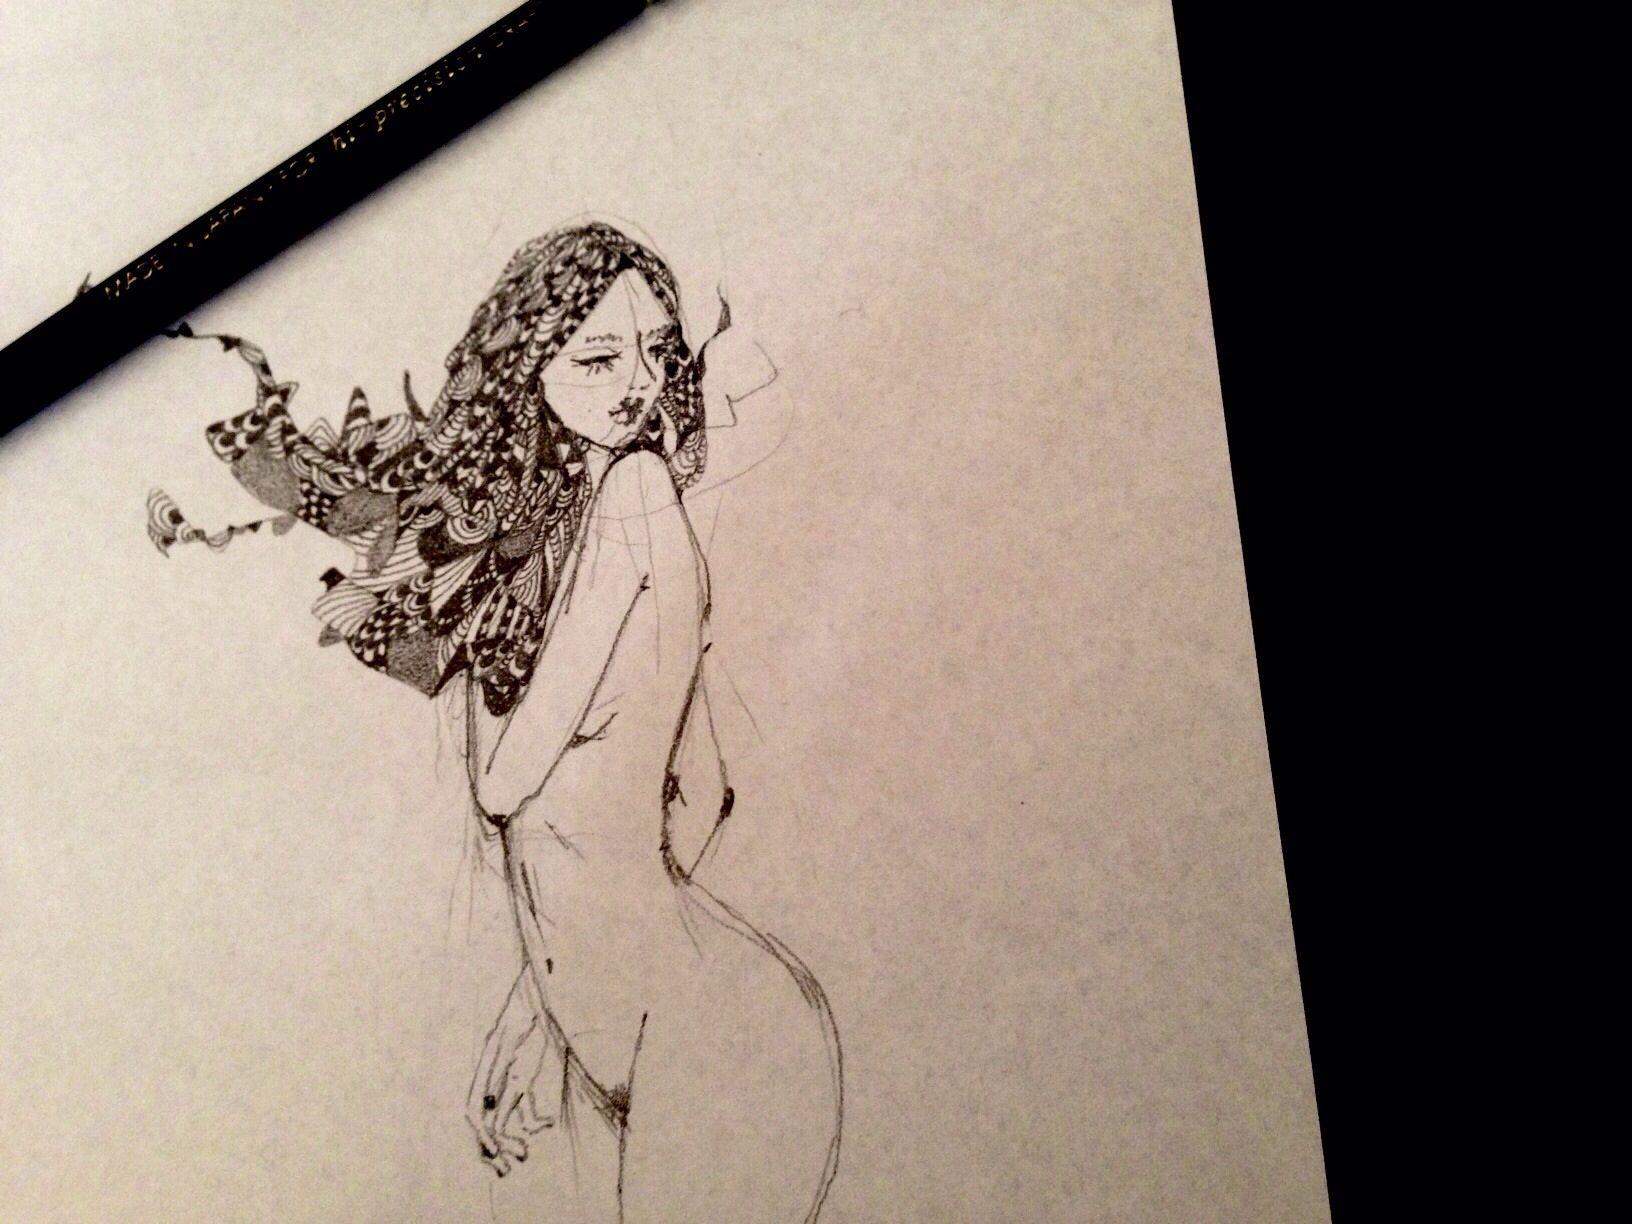 Nolita Jpn illustration